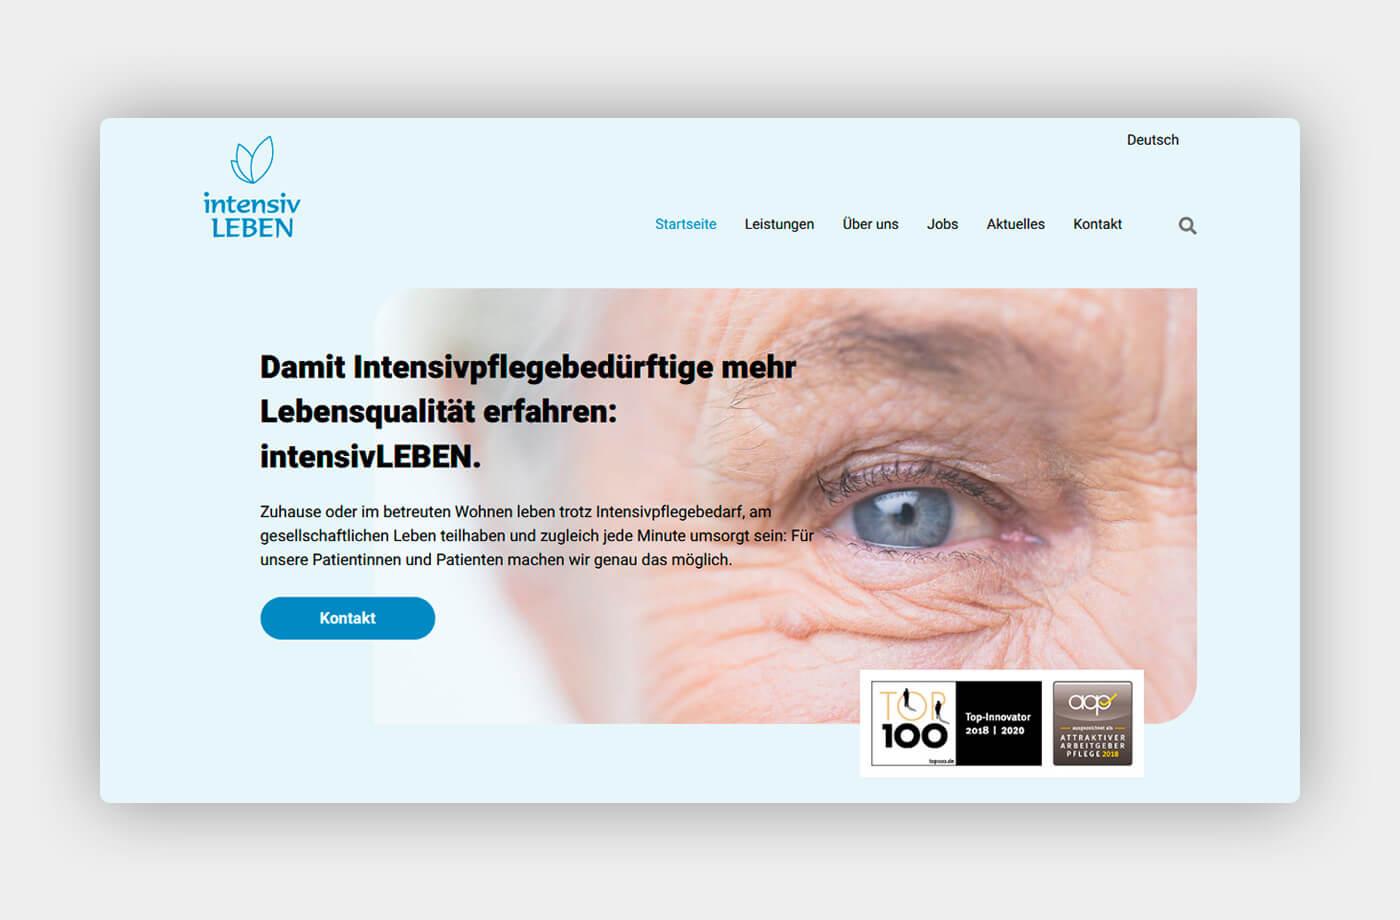 intensivLEBEN GmbH